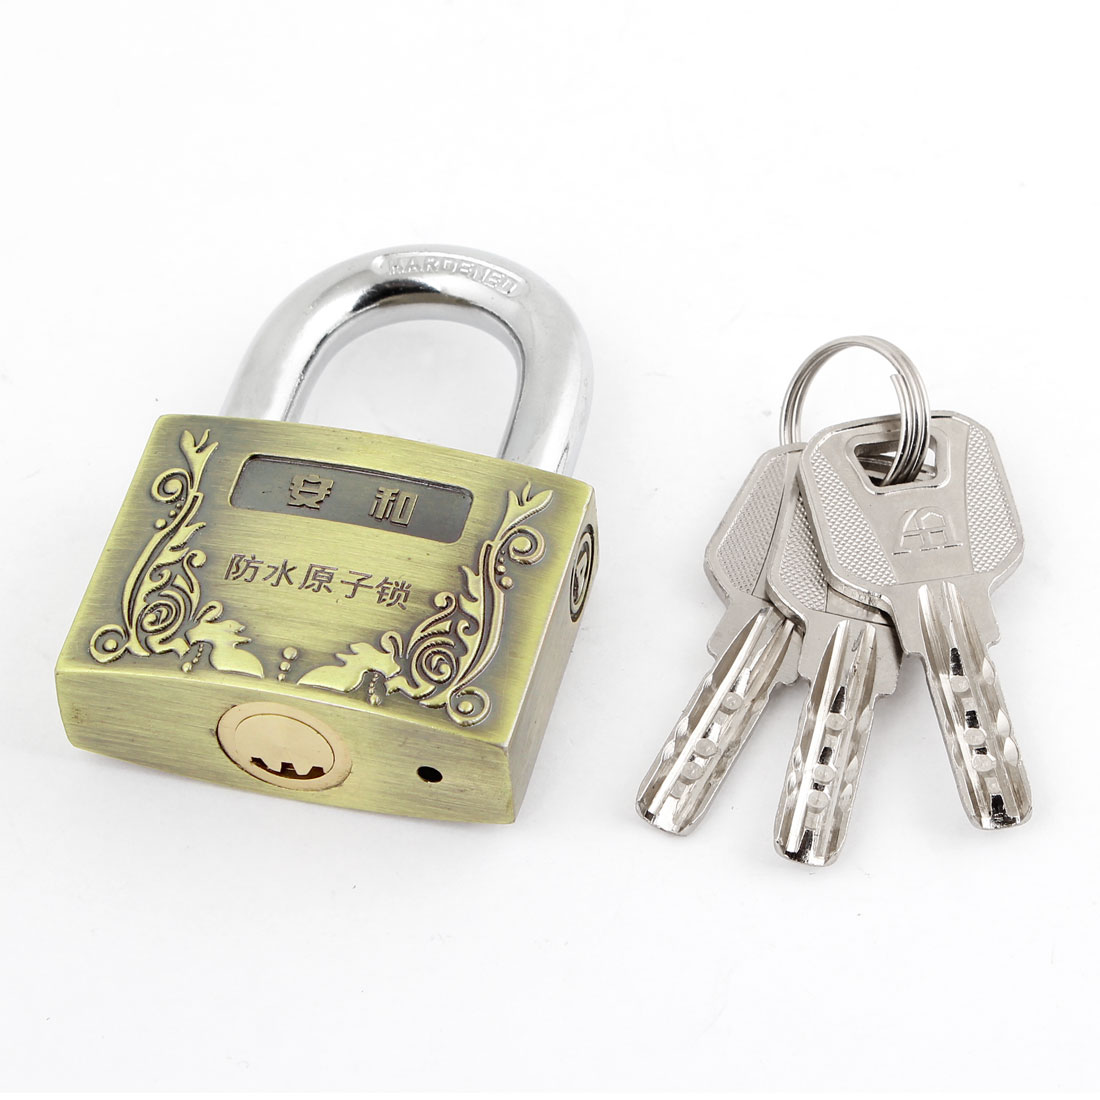 50mm Wide Keys Locking Bronze Tone Metal Security Padlock Lock